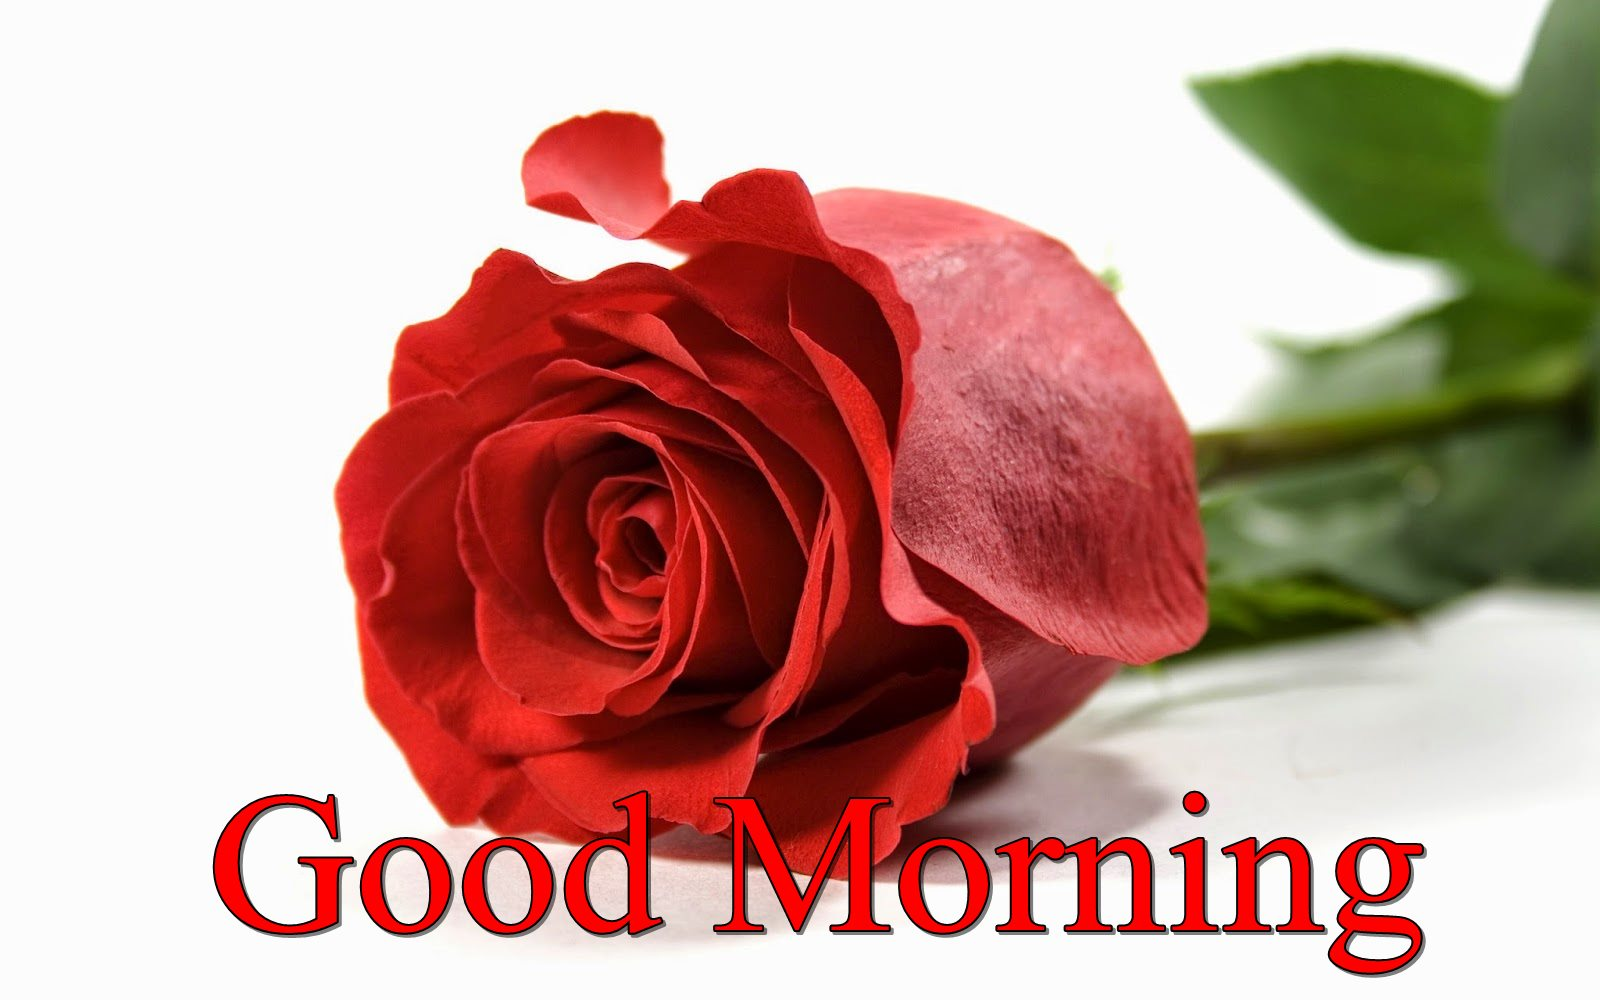 Good Morning Rose Season Flowers Nature Wallpaper - Good Morning Happy New Year 2018 - HD Wallpaper